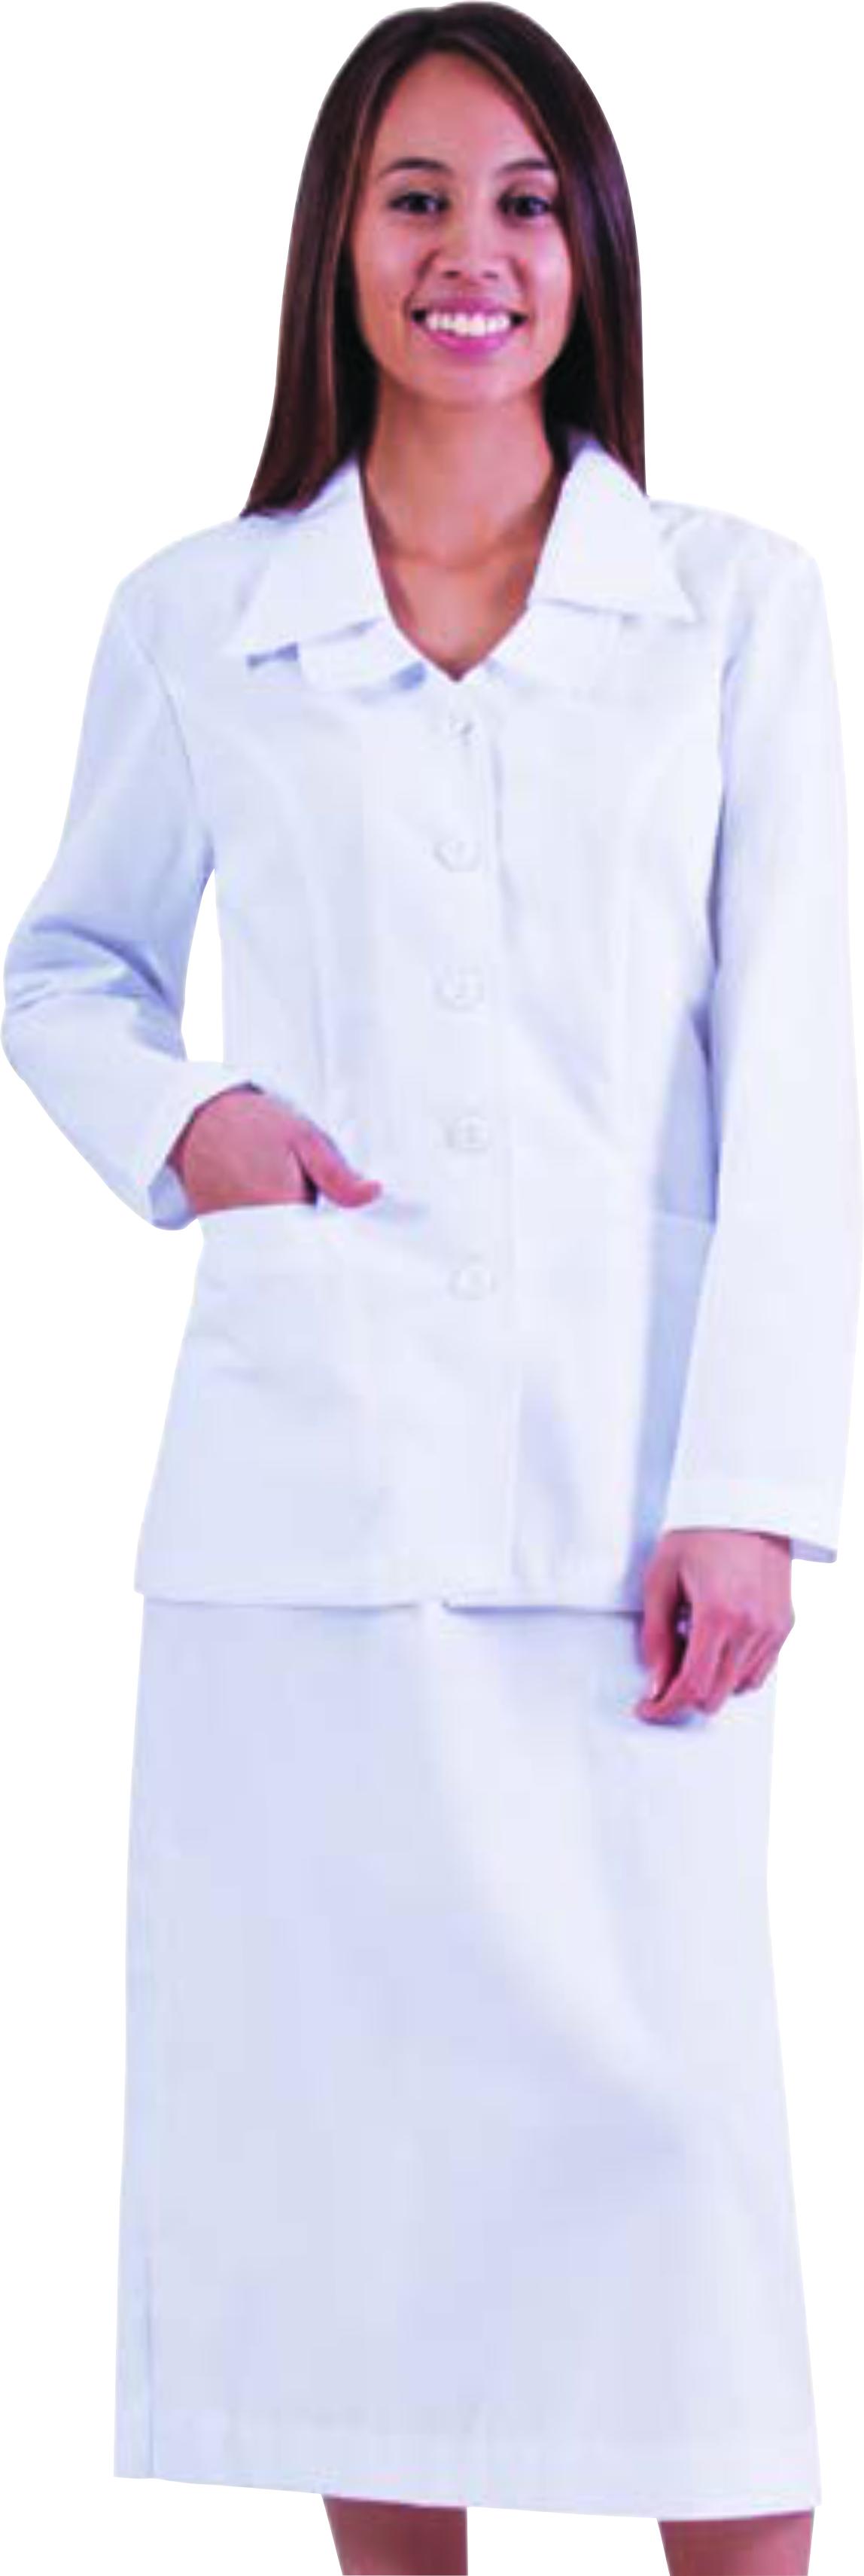 Nurse Tunics 04